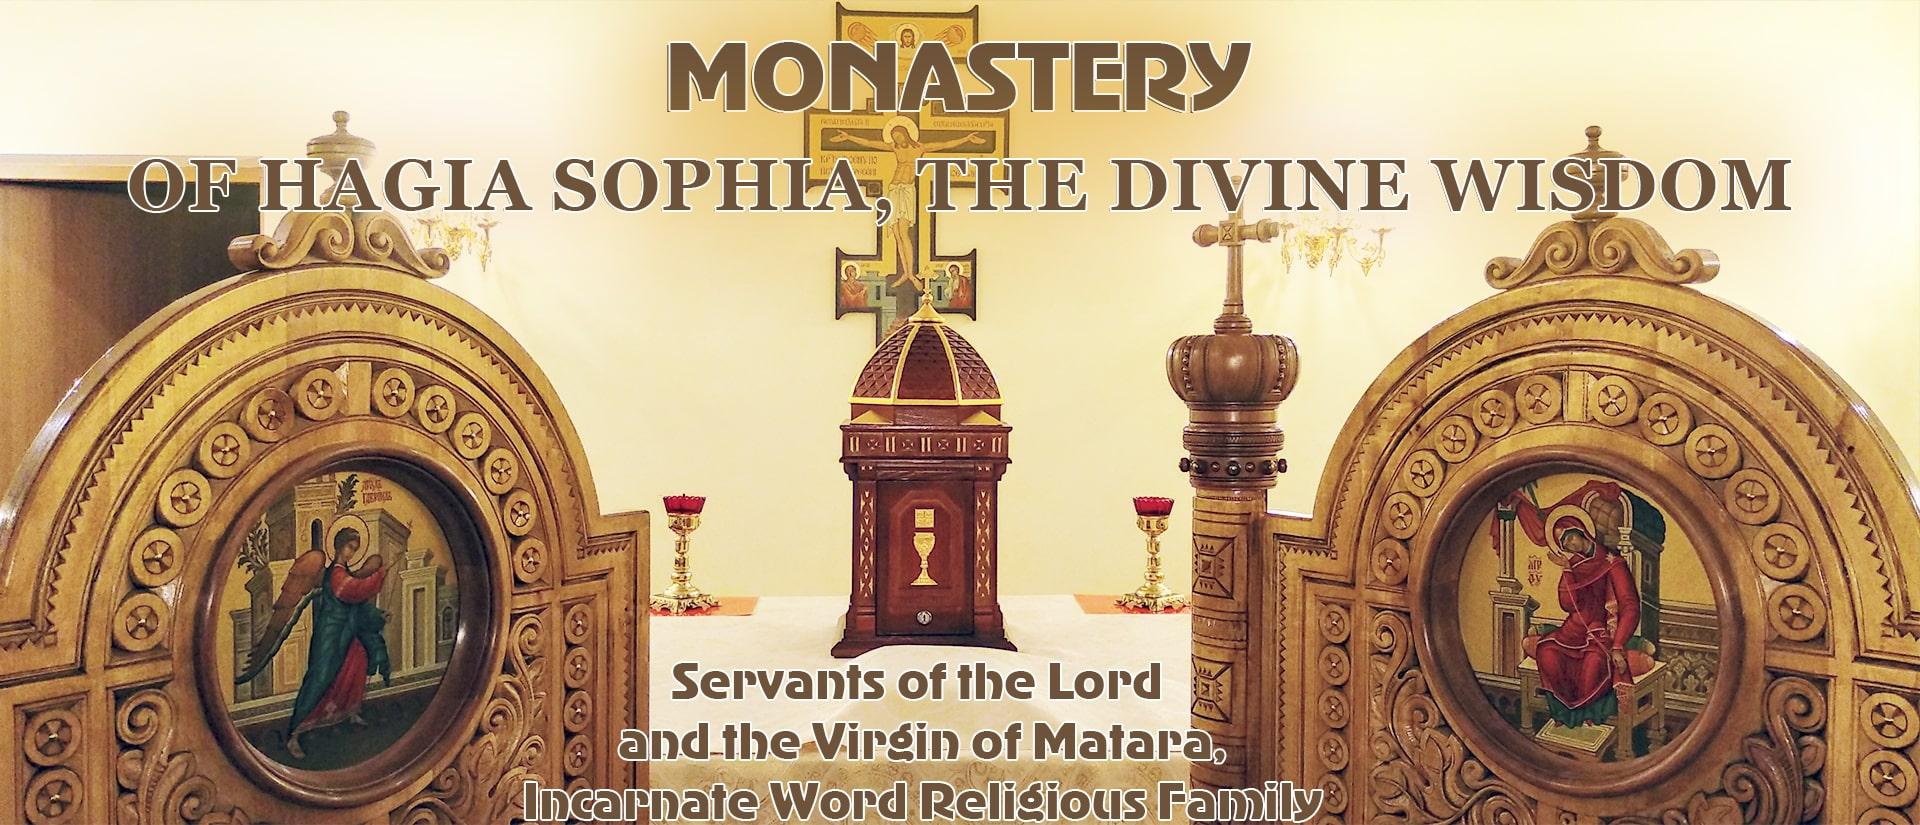 Monastery Hagia Sophia the Divine Wisdom